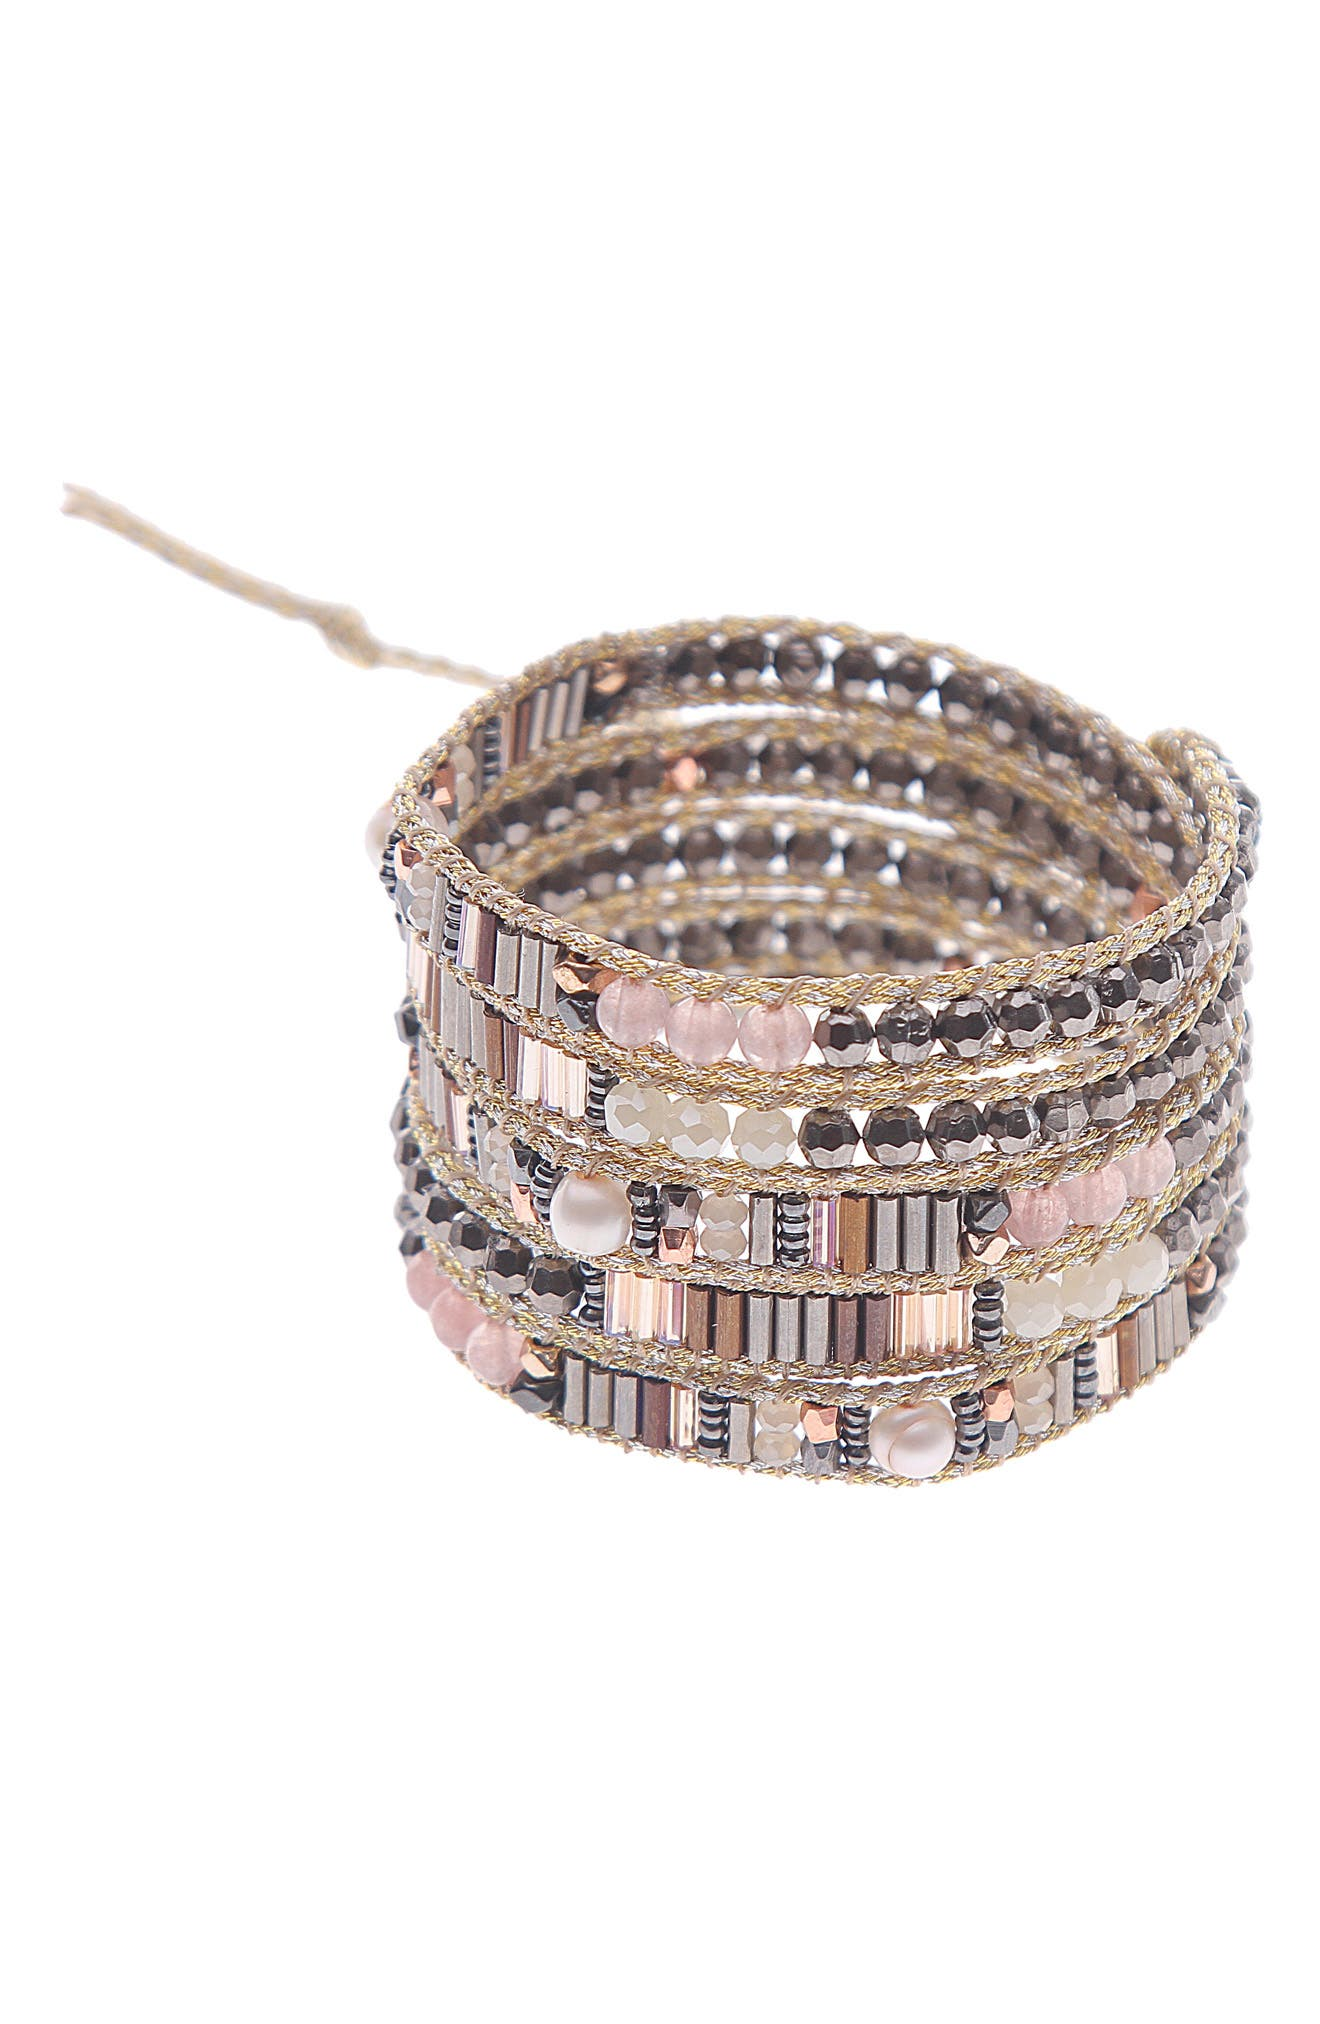 Crystal Beaded Wrap Bracelet,                             Main thumbnail 1, color,                             900